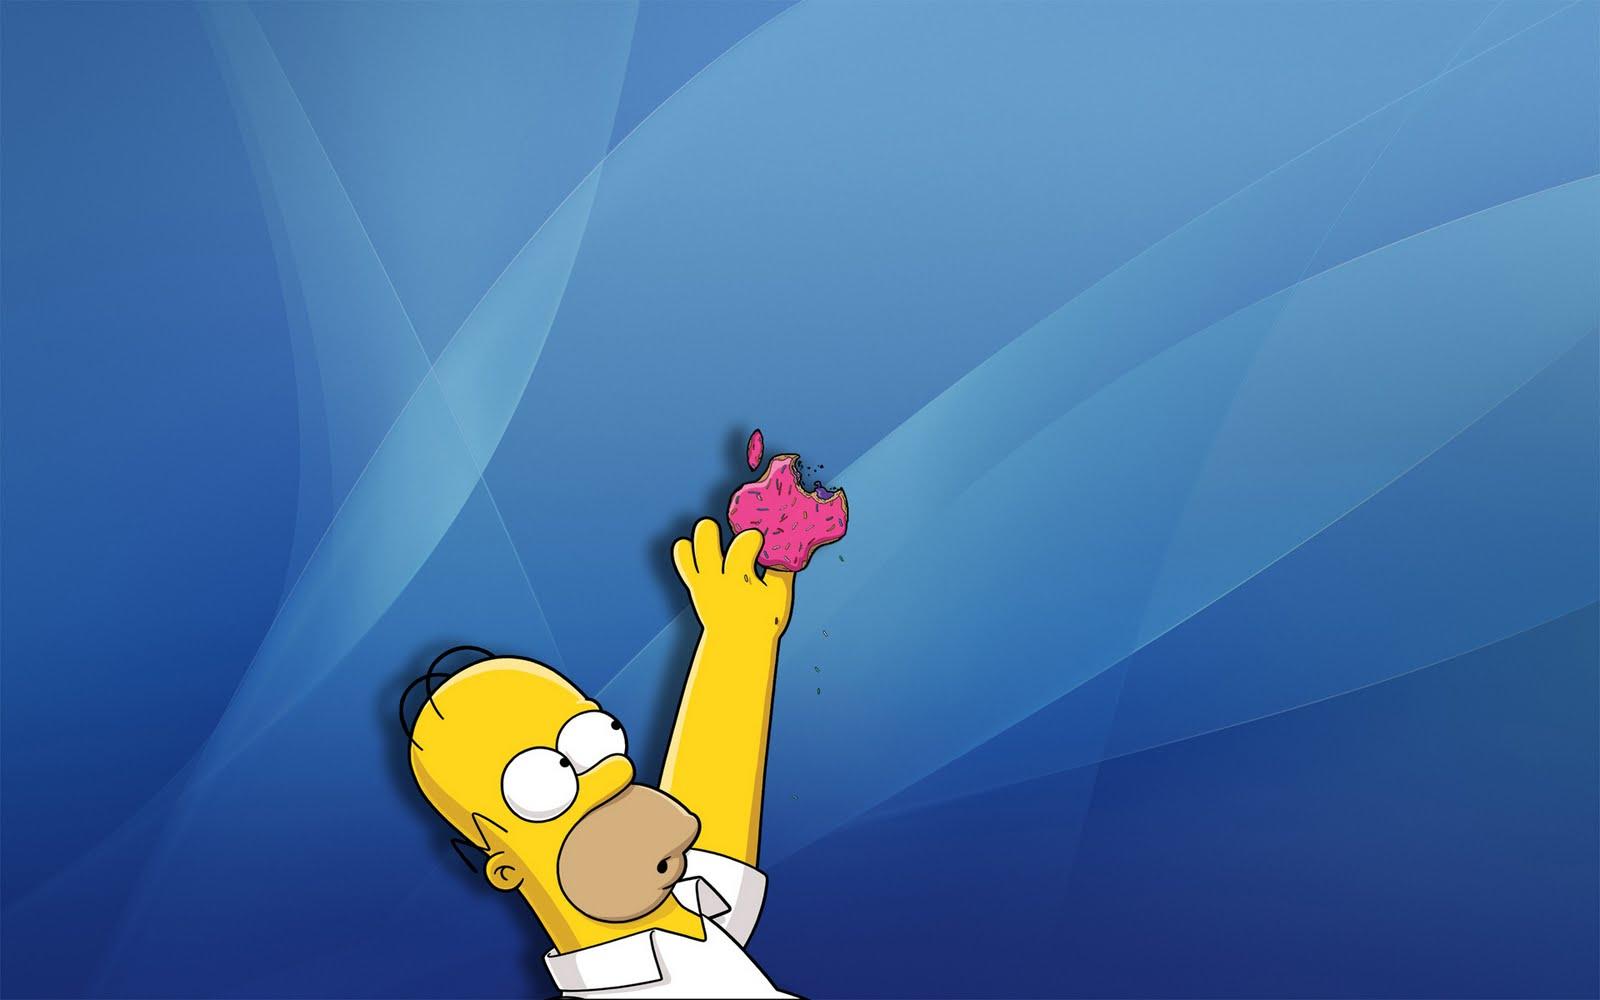 http://2.bp.blogspot.com/_4zTzx8QBOi8/TK8cDLqs9NI/AAAAAAAACm0/3Bhp-_j24Qo/s1600/Wallpapers-room_com___Simpsons_Homer_Apple_by_Torqu3_1920x1200-795821.jpg